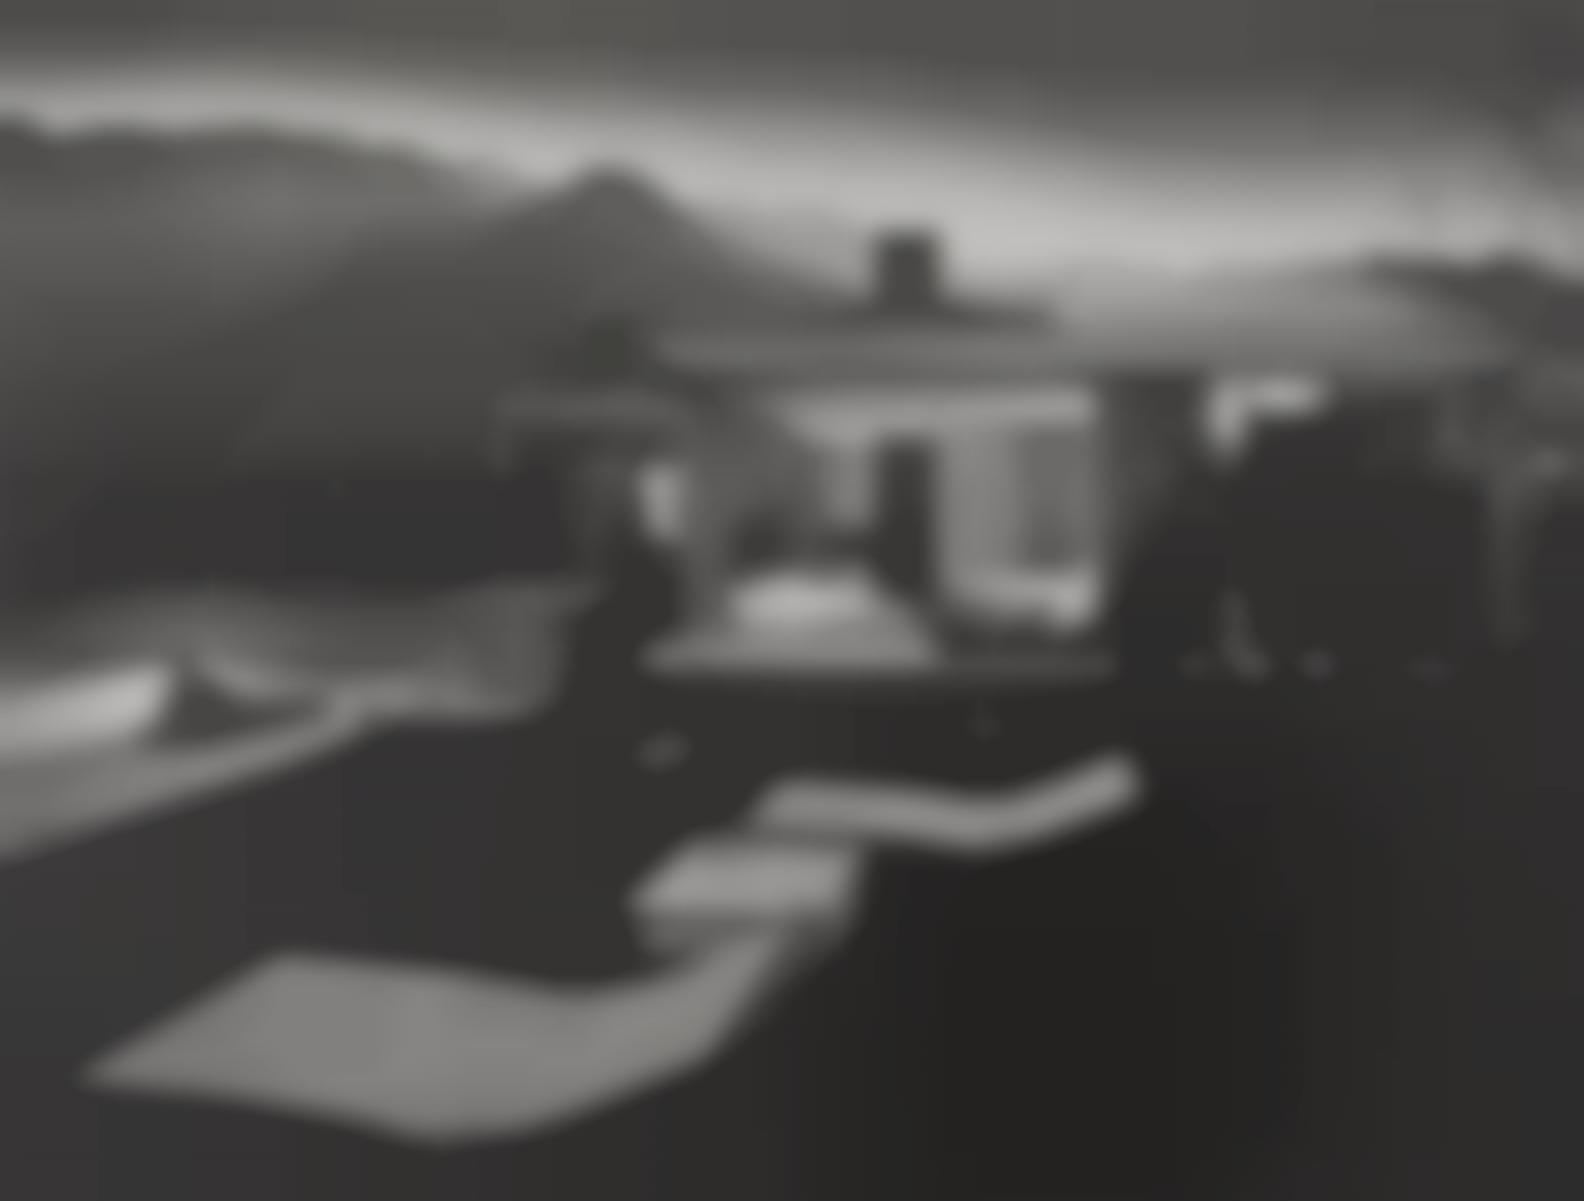 Julius Shulman-Kaufman House, Palm Springs, California, Richard Neutra, Architect-1947